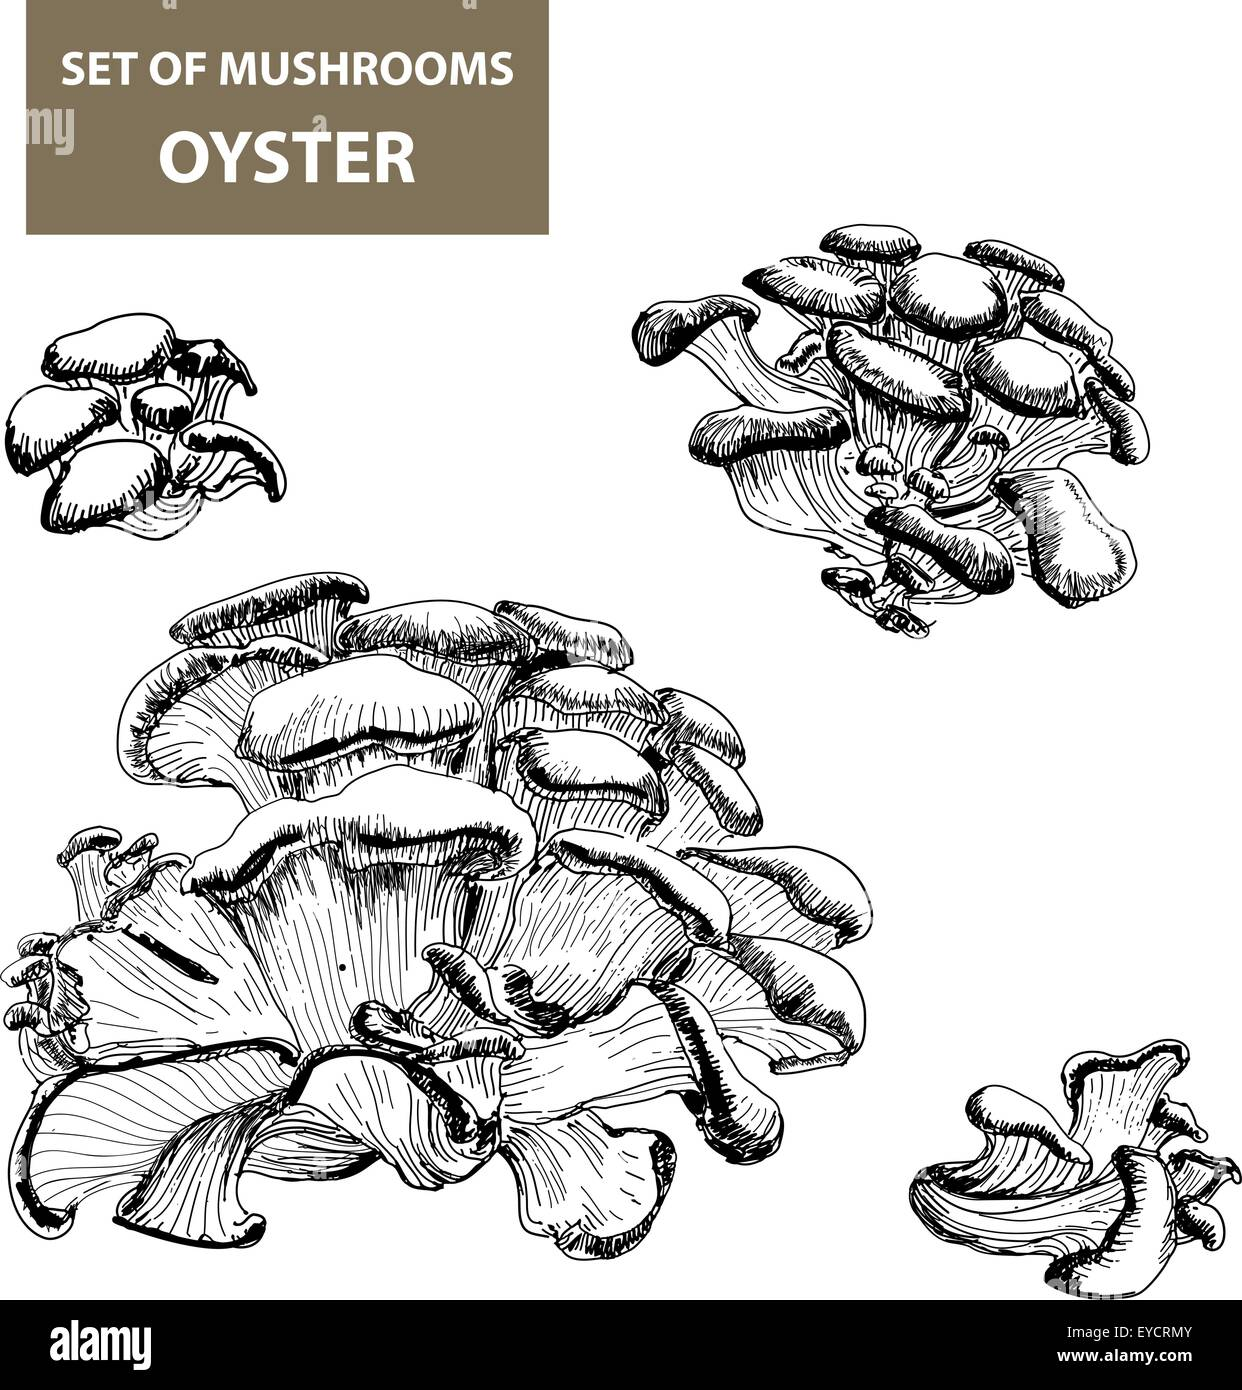 Mushrooms. Oyster. - Stock Image